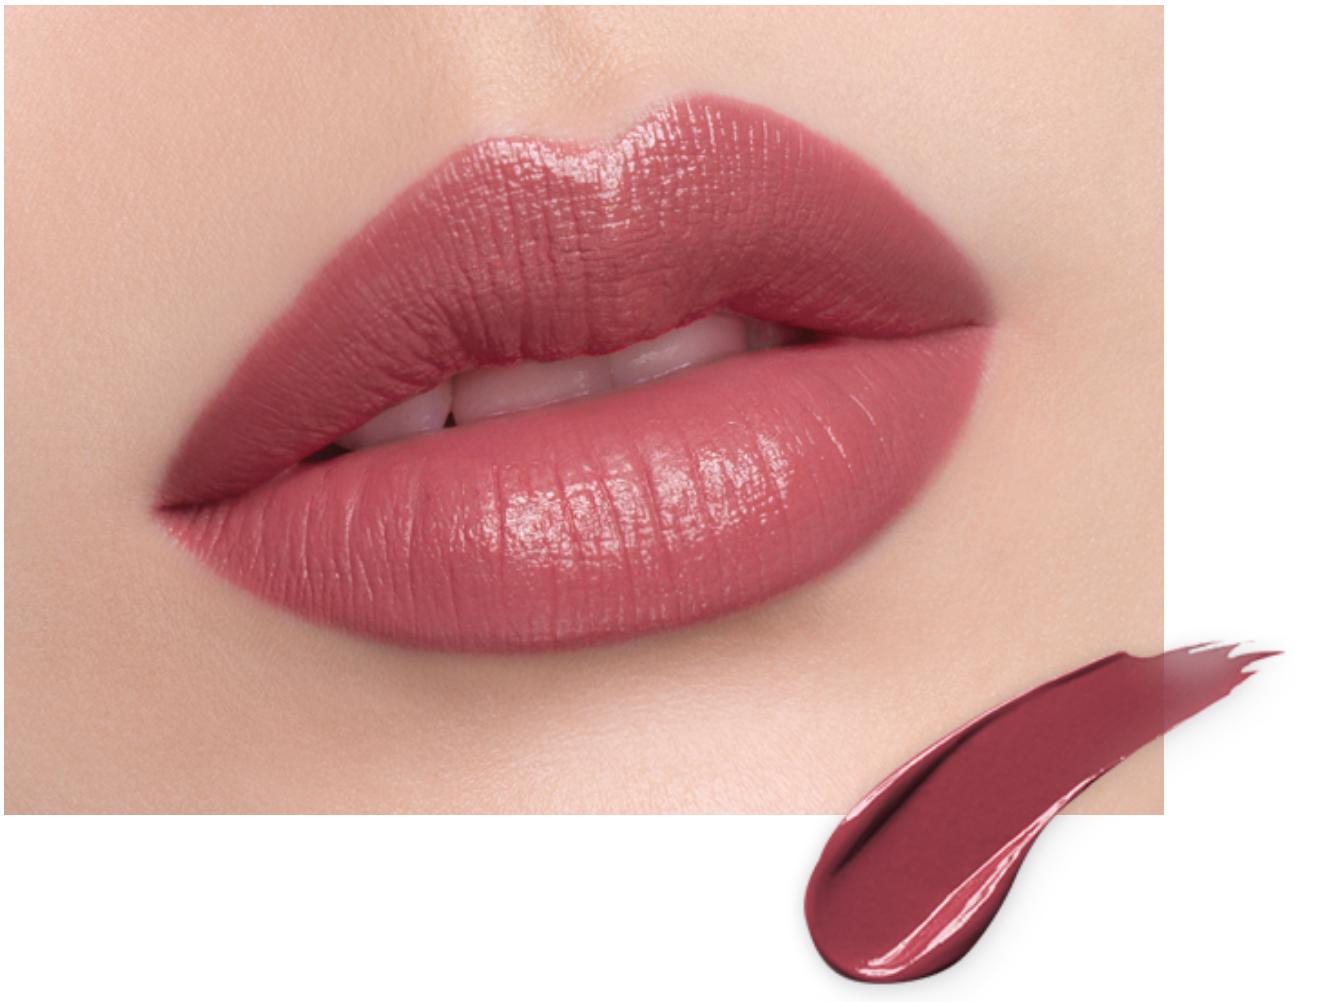 laneige-silk-intense-lipstick-480.png